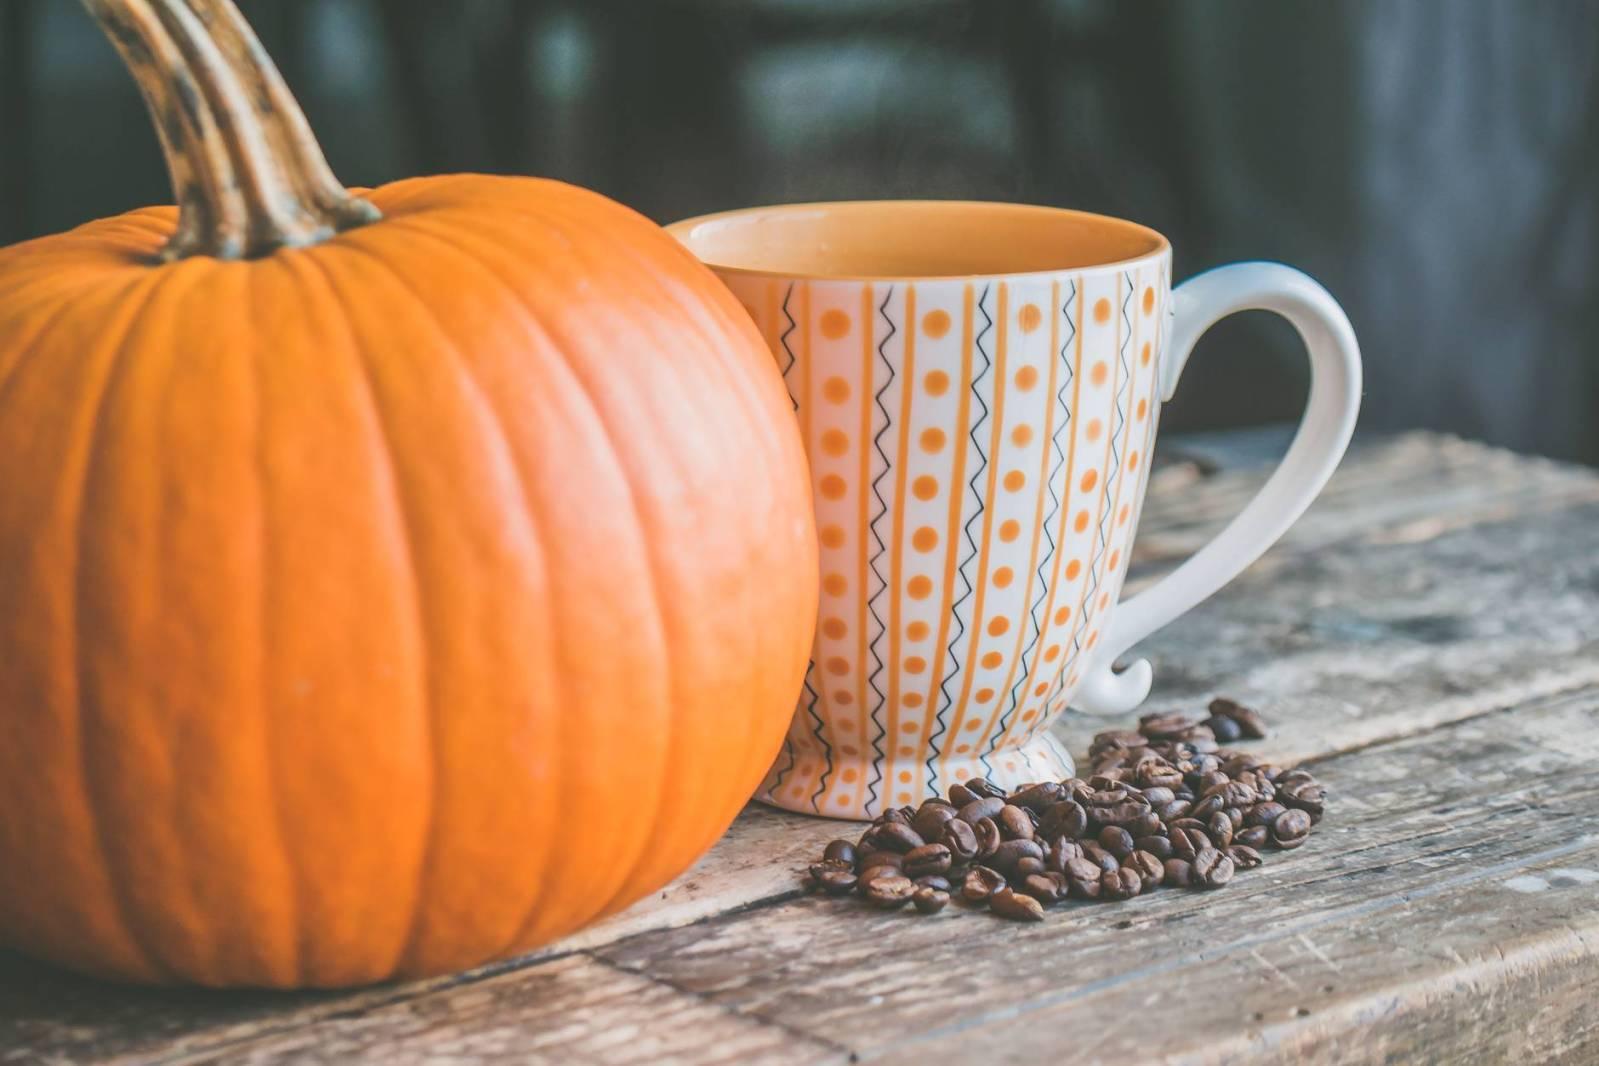 orange pumpkin near white ceramic mug with seeds